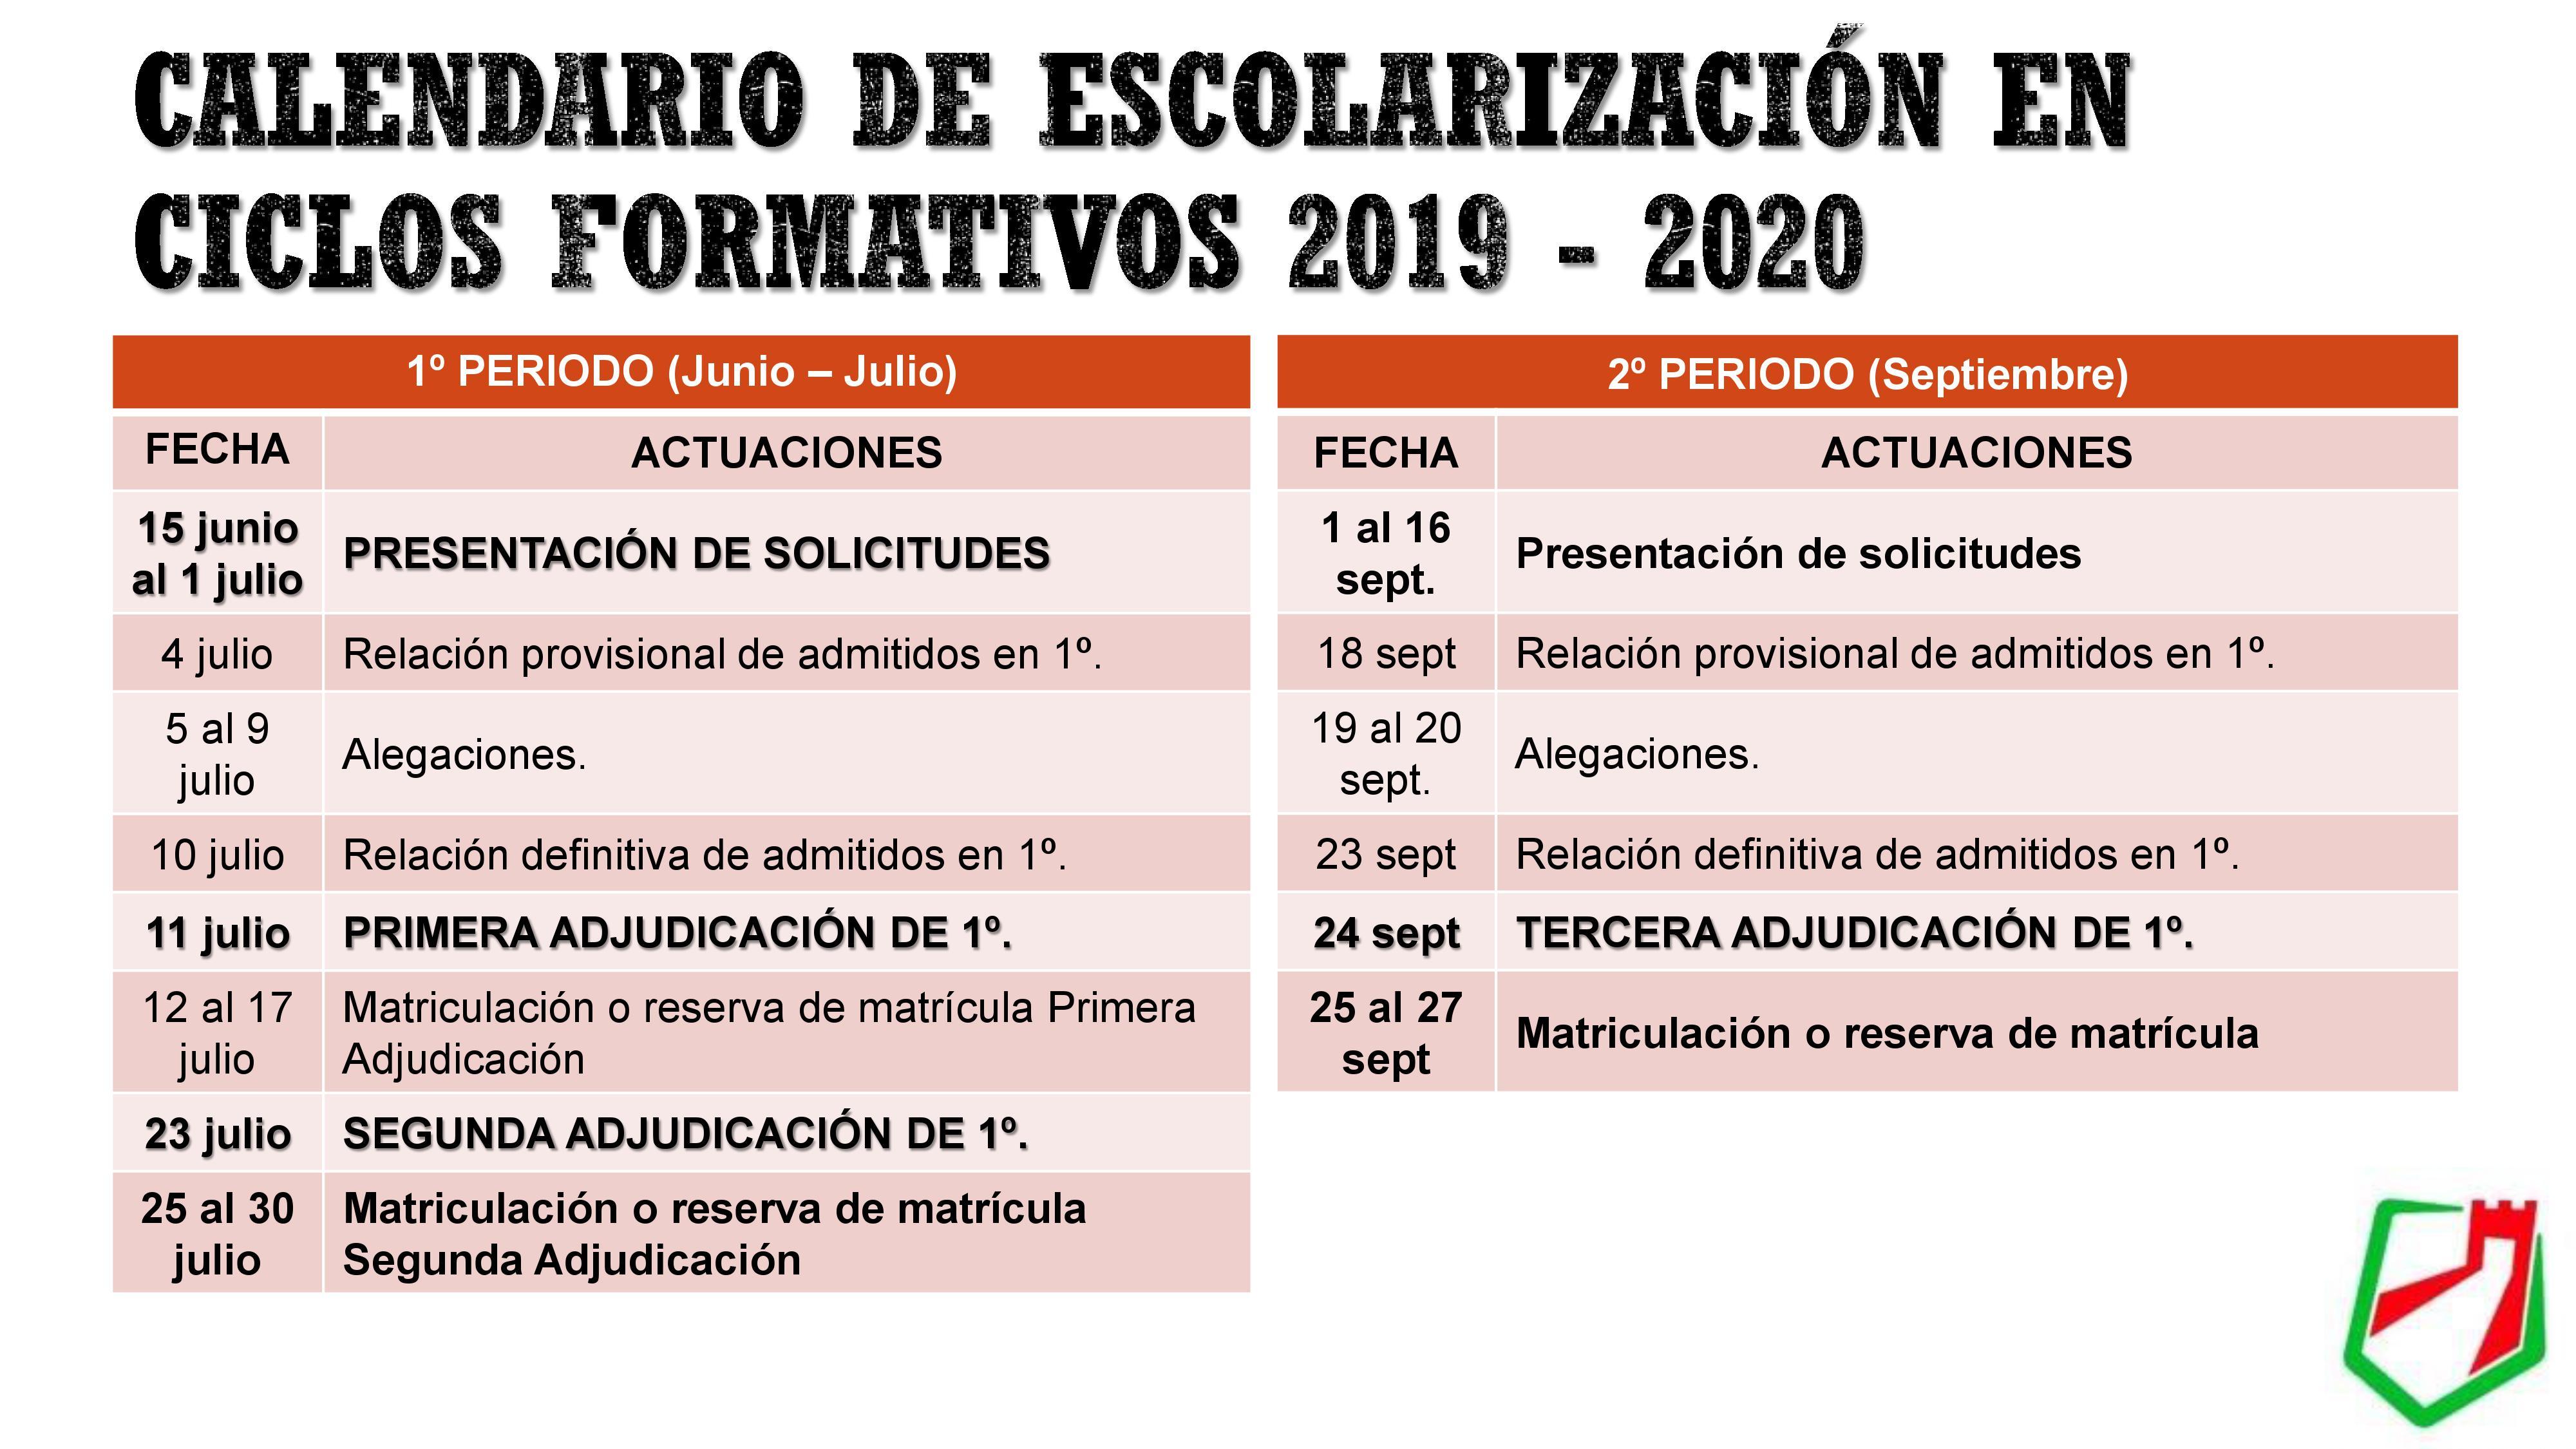 CALENDARIO ESCOLARIZACIÓN A CICLOS FORMATIVOS 2019 2020 II